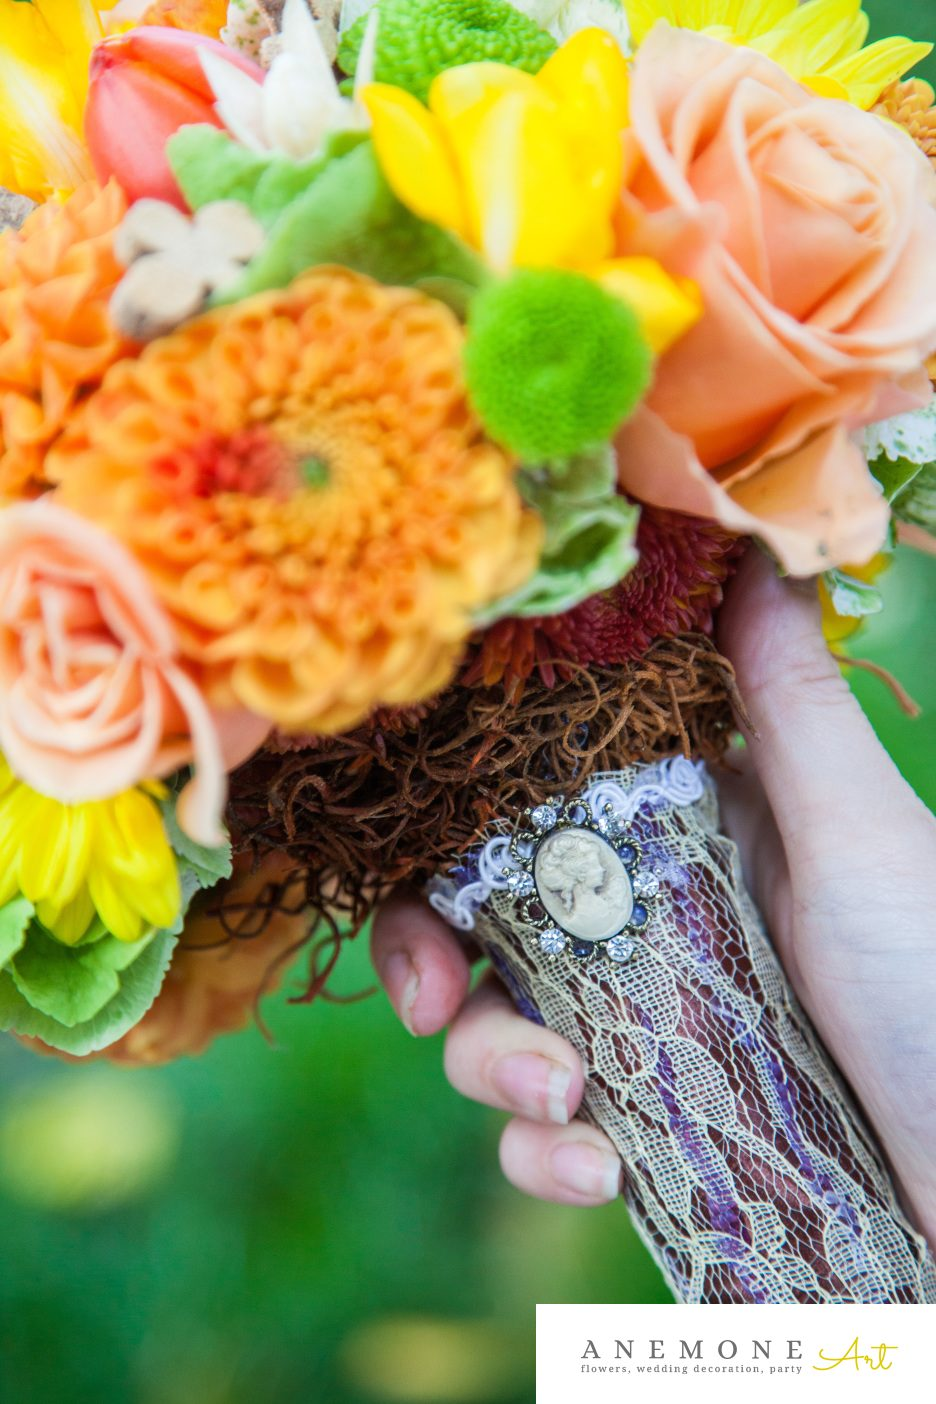 Poza, foto cu Flori de nunta buchet mireasa, galben, maner buchet, maro, portocaliu in Arad, Timisoara, Oradea (wedding flowers, bouquets) nunta Arad, Timisoara, Oradea